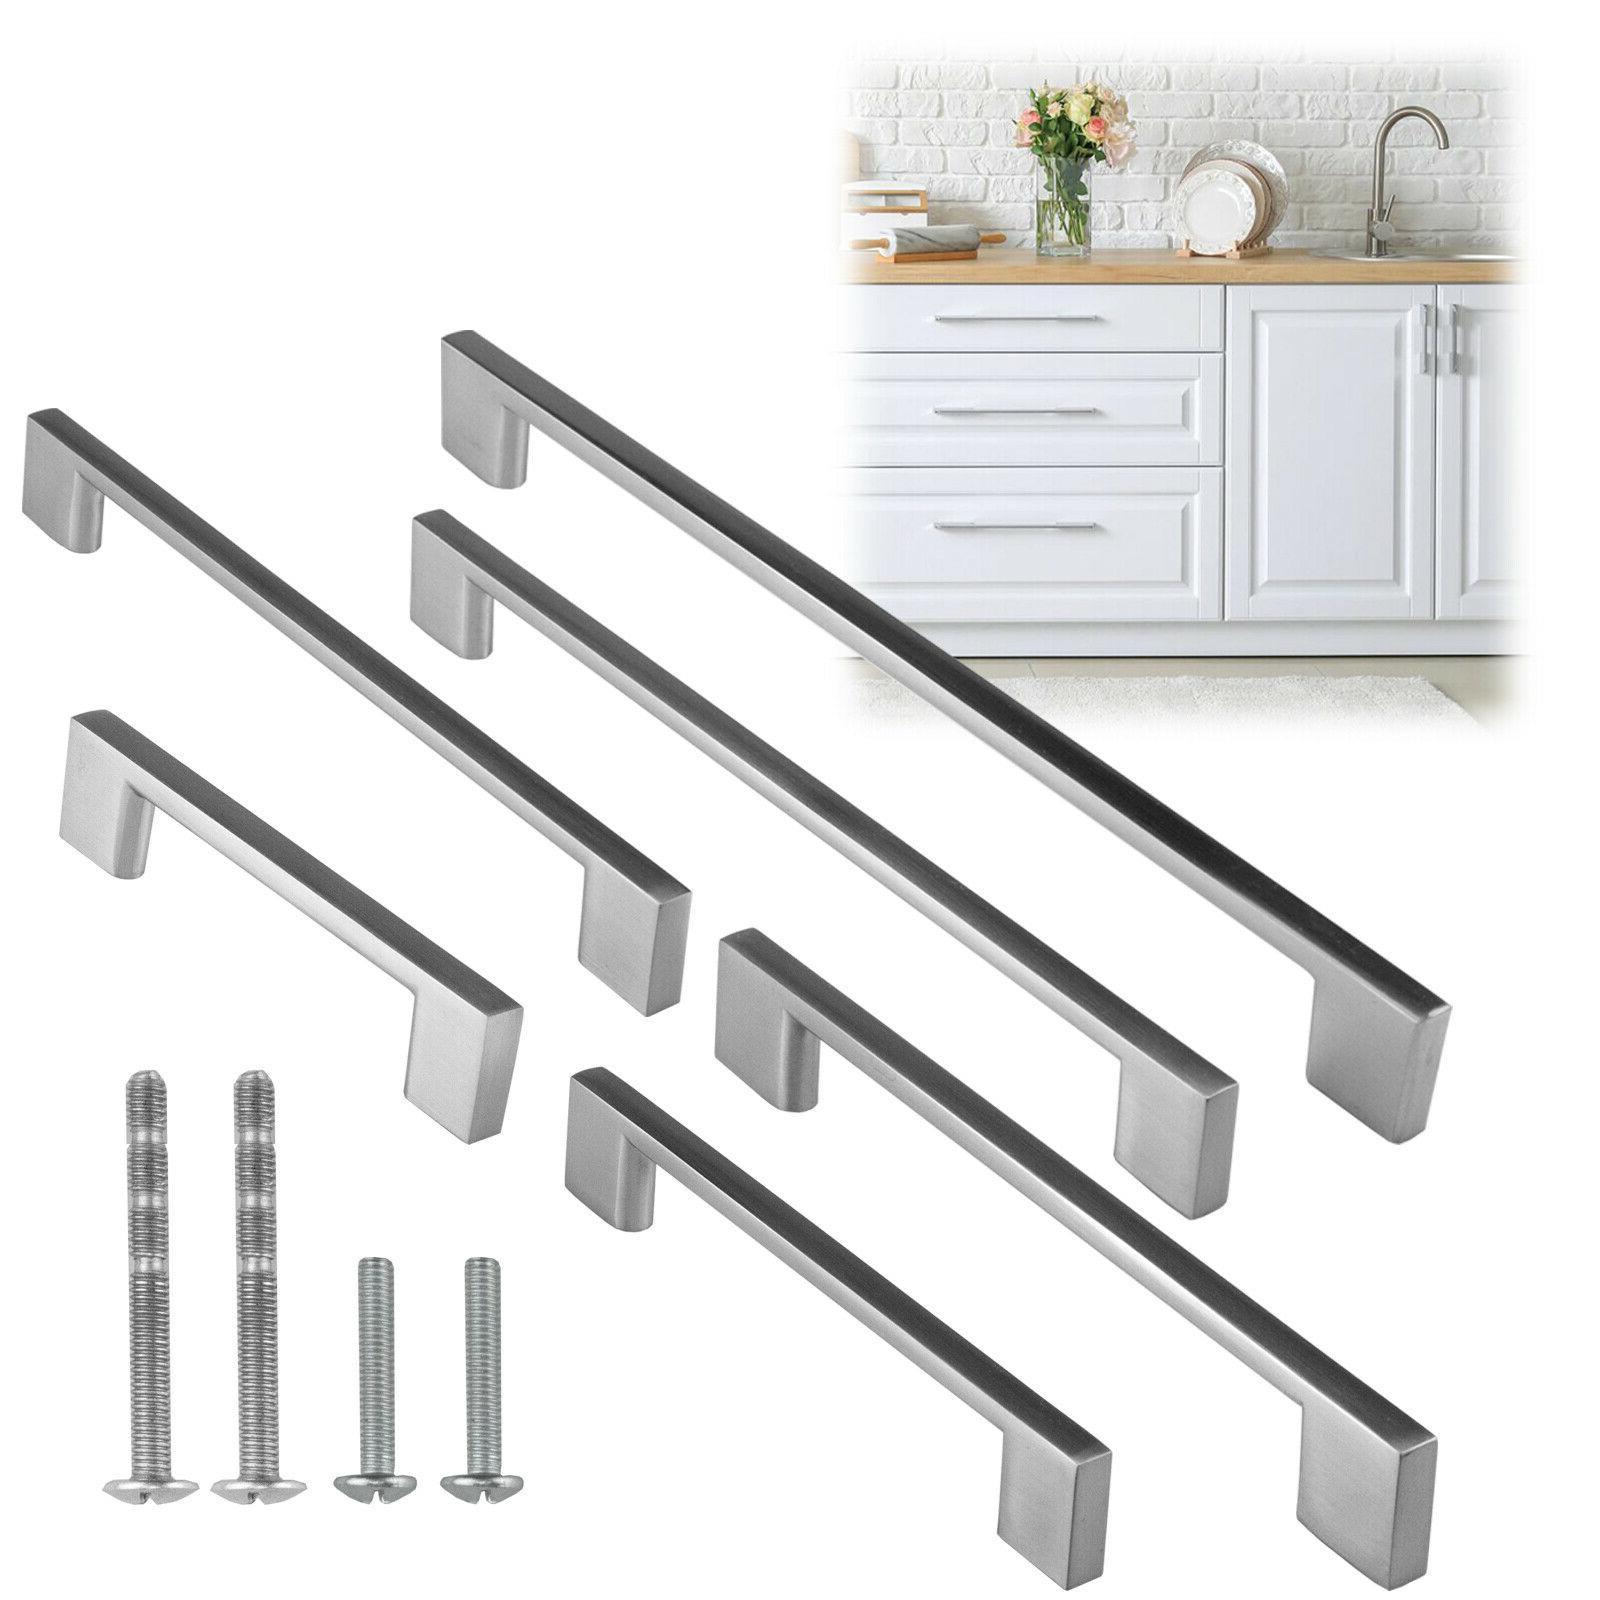 4 3 4 to 14 inch rectangular